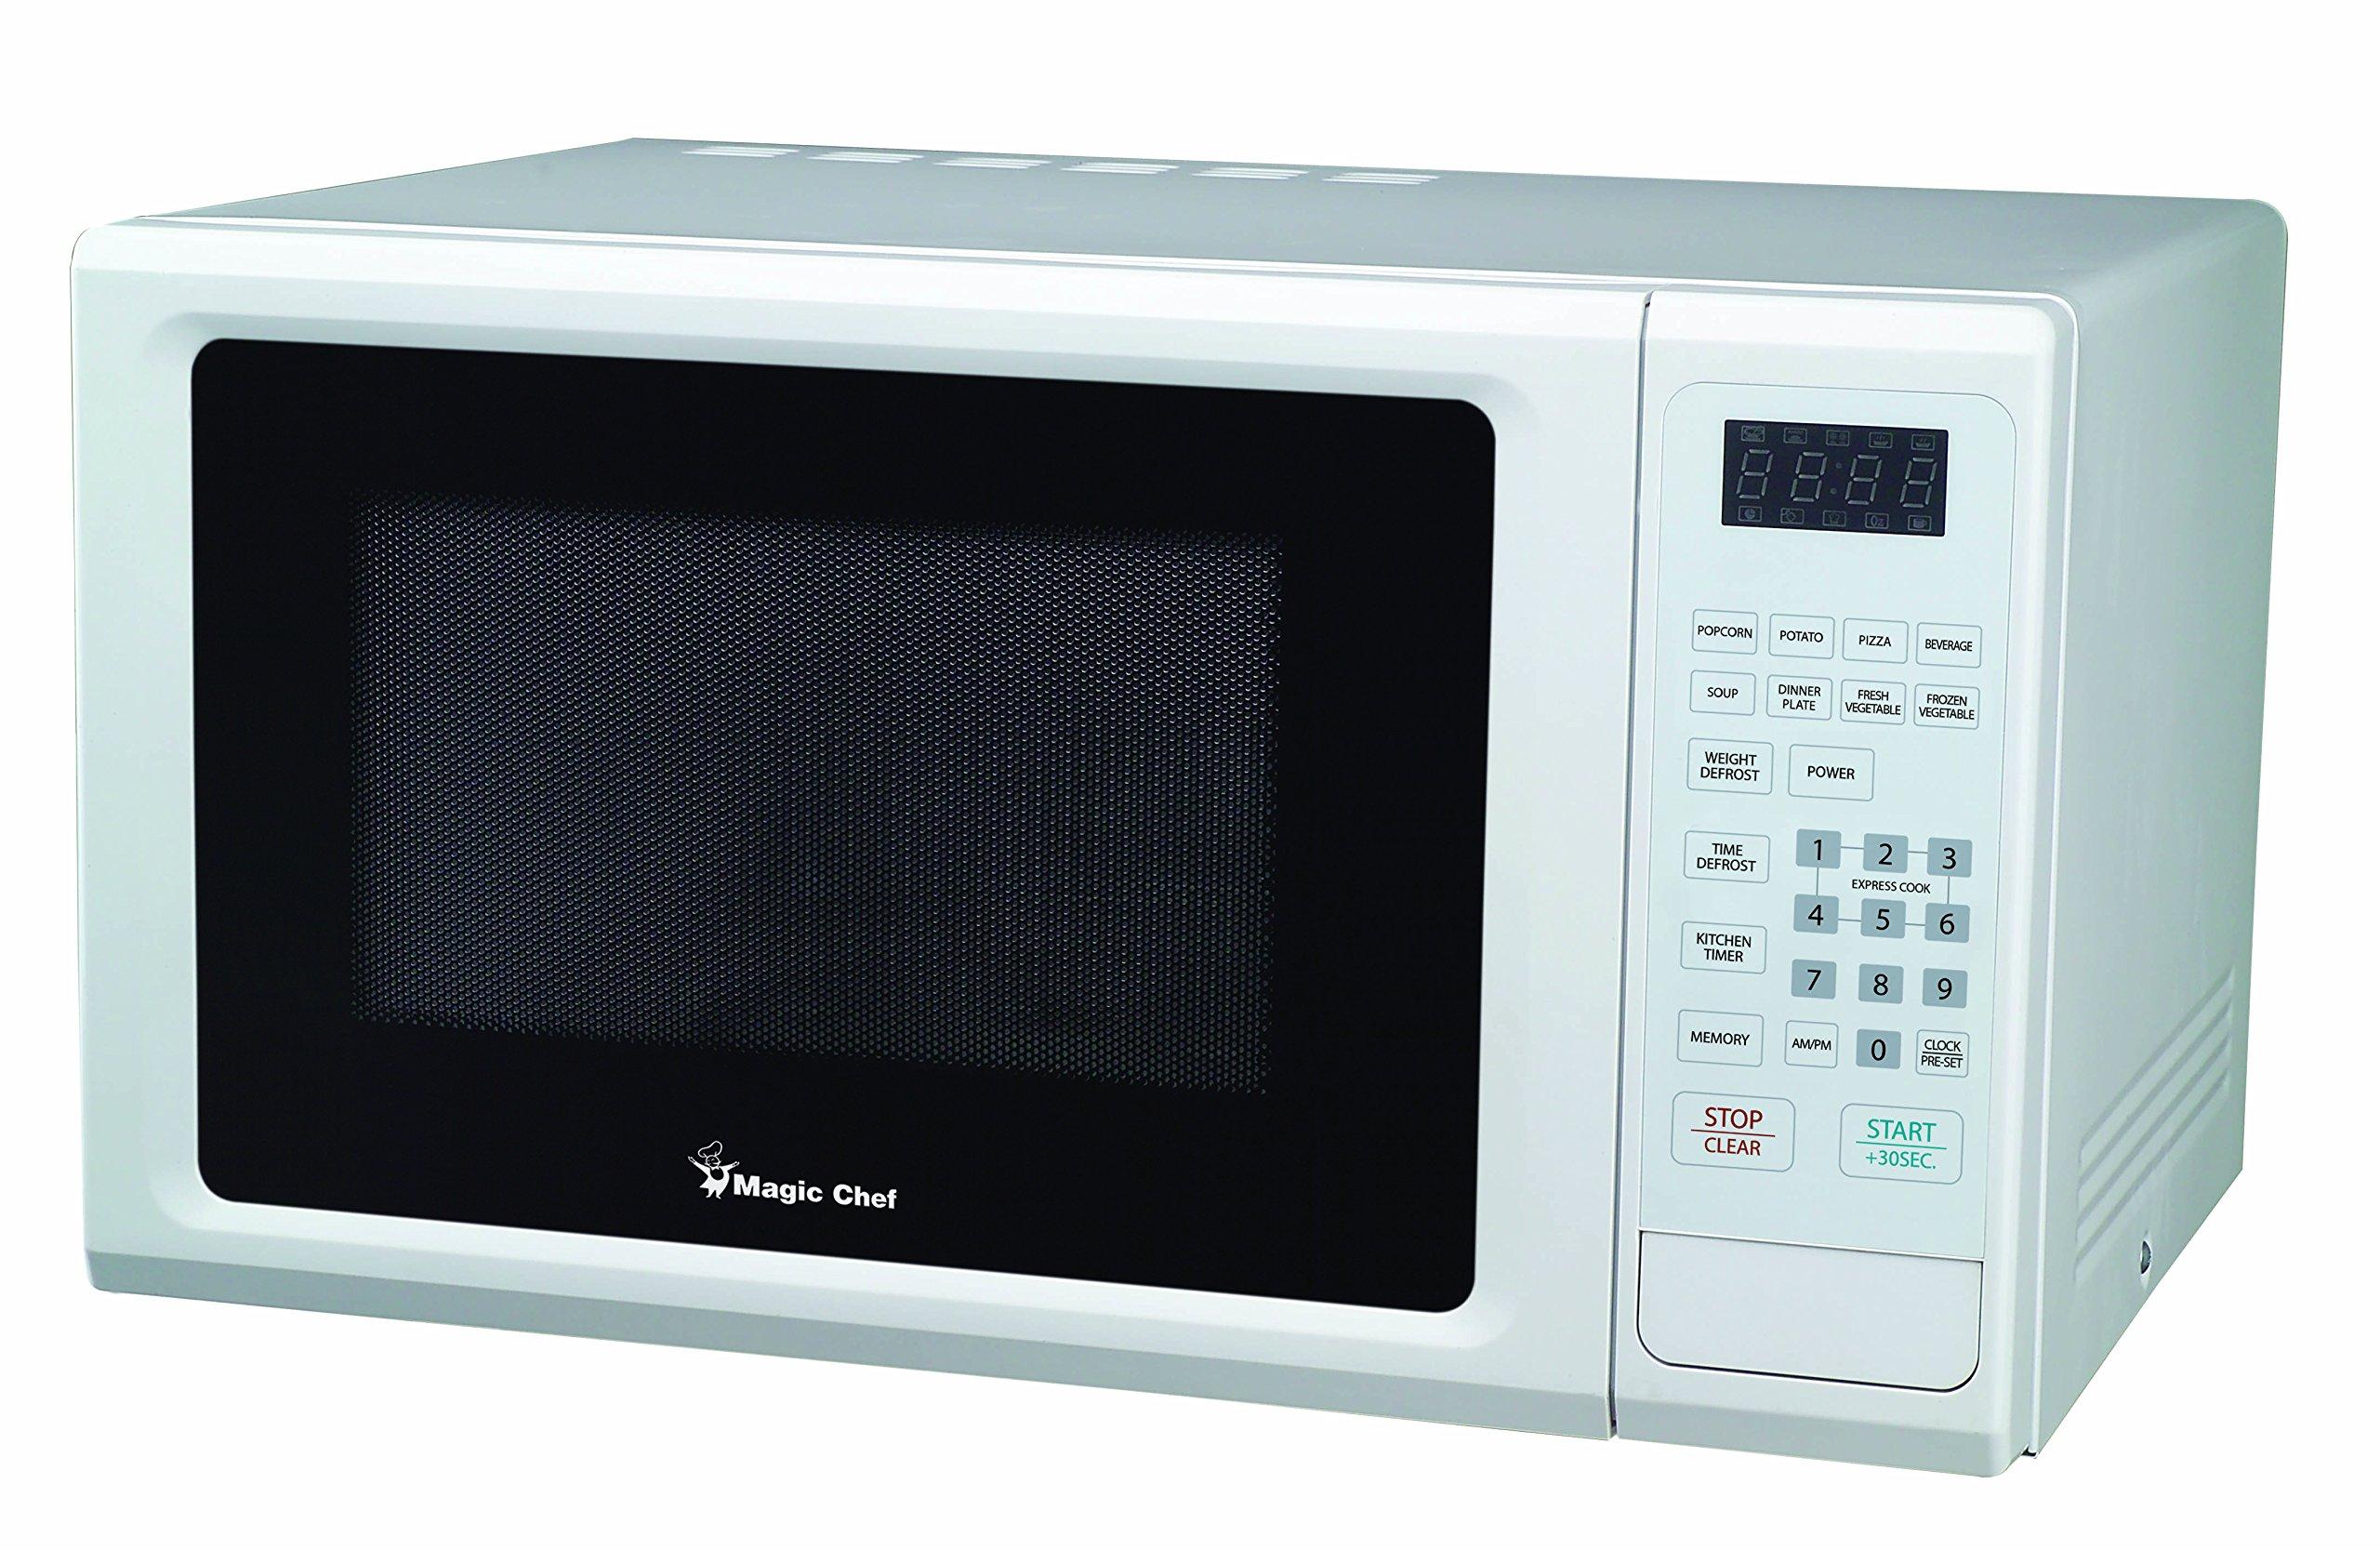 Magic Chef MCM1110W 1.1 cu.ft. 1000W Microwave, White